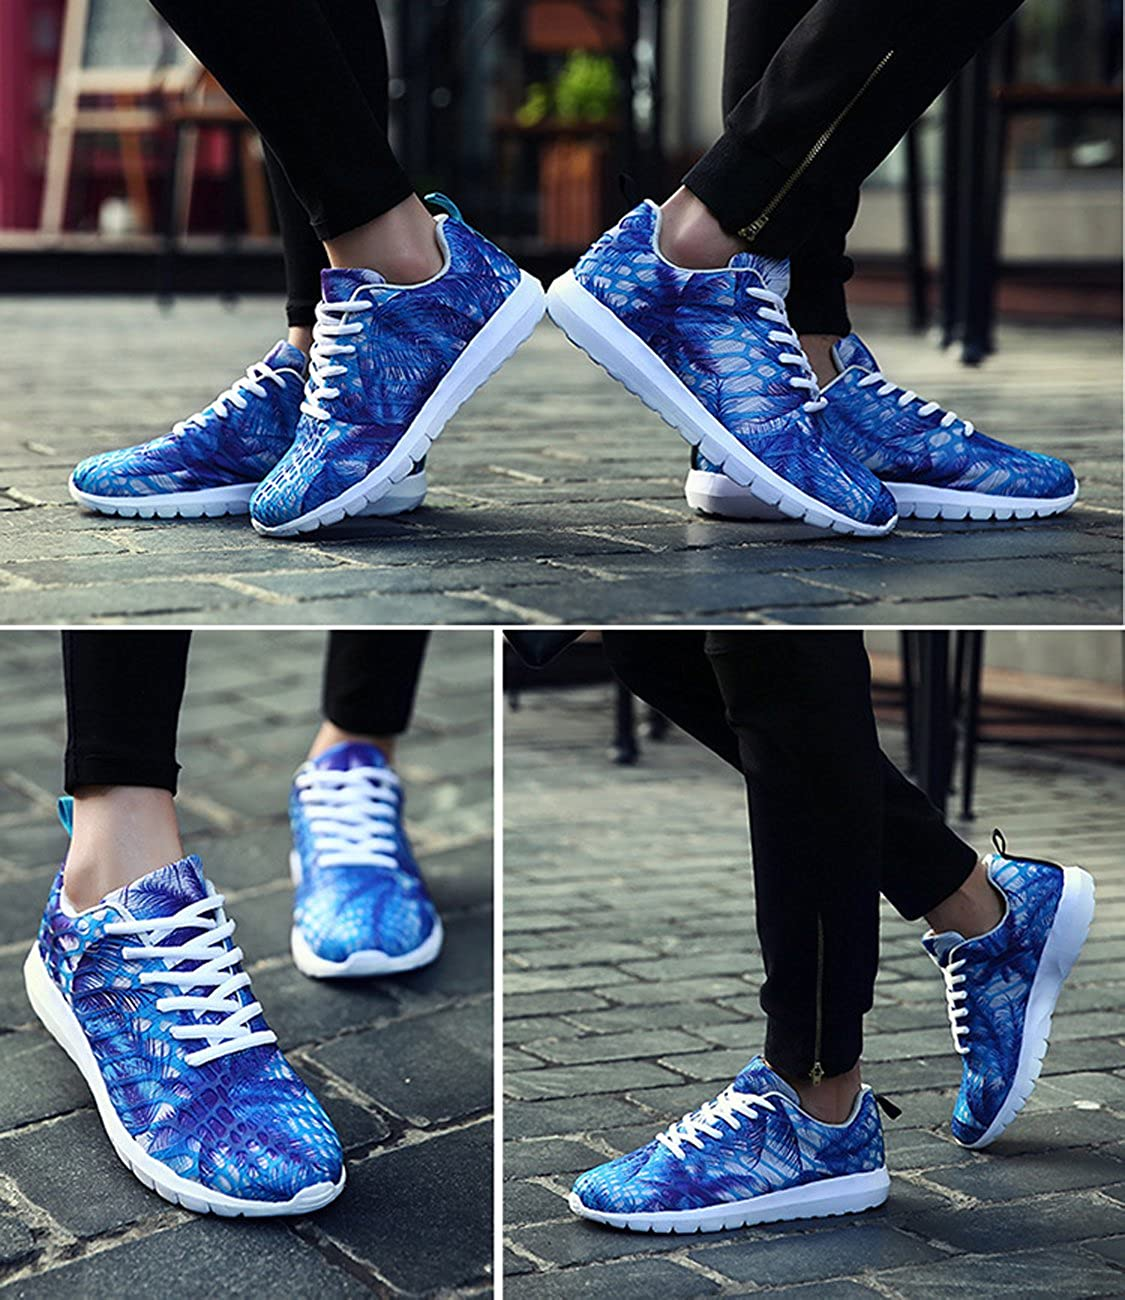 CZF Women Pretty Fashion Sports Shoes Running Sneakers